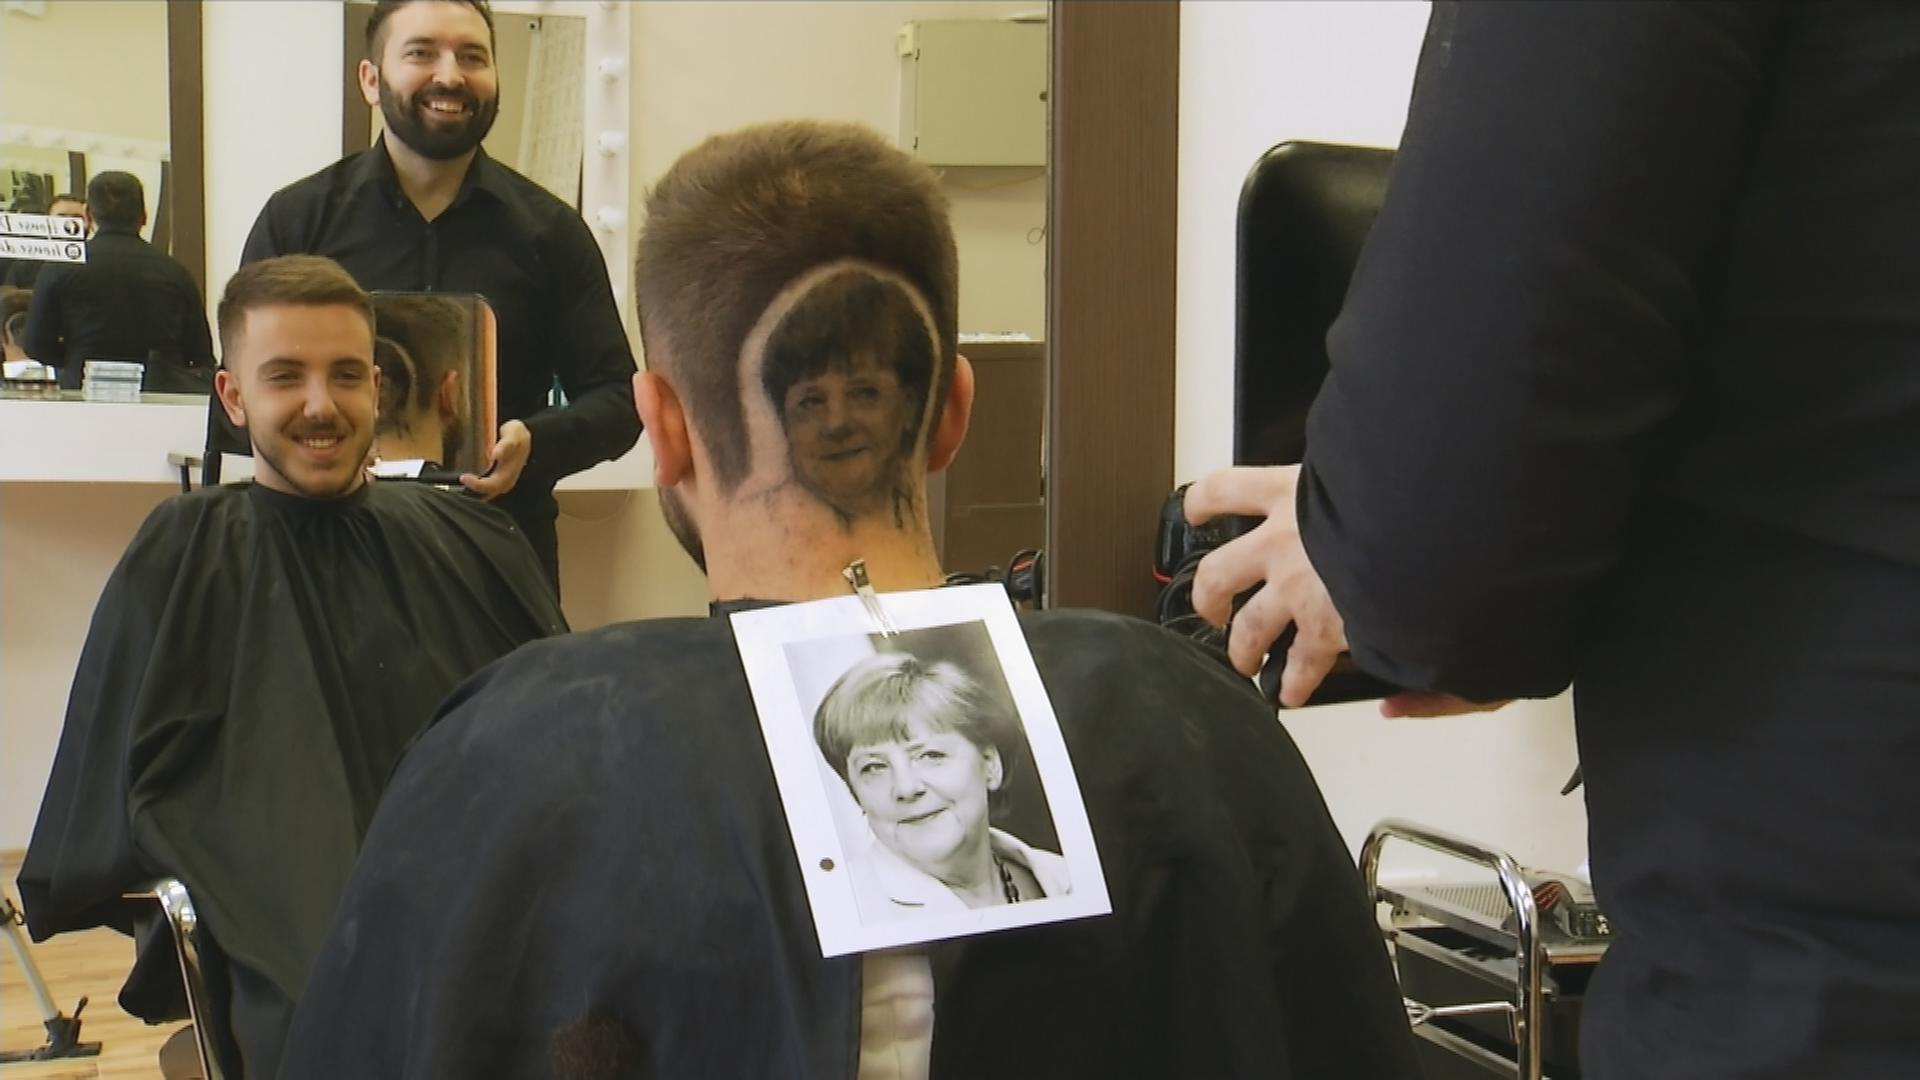 Merkel Als Frisur Zdfmediathek